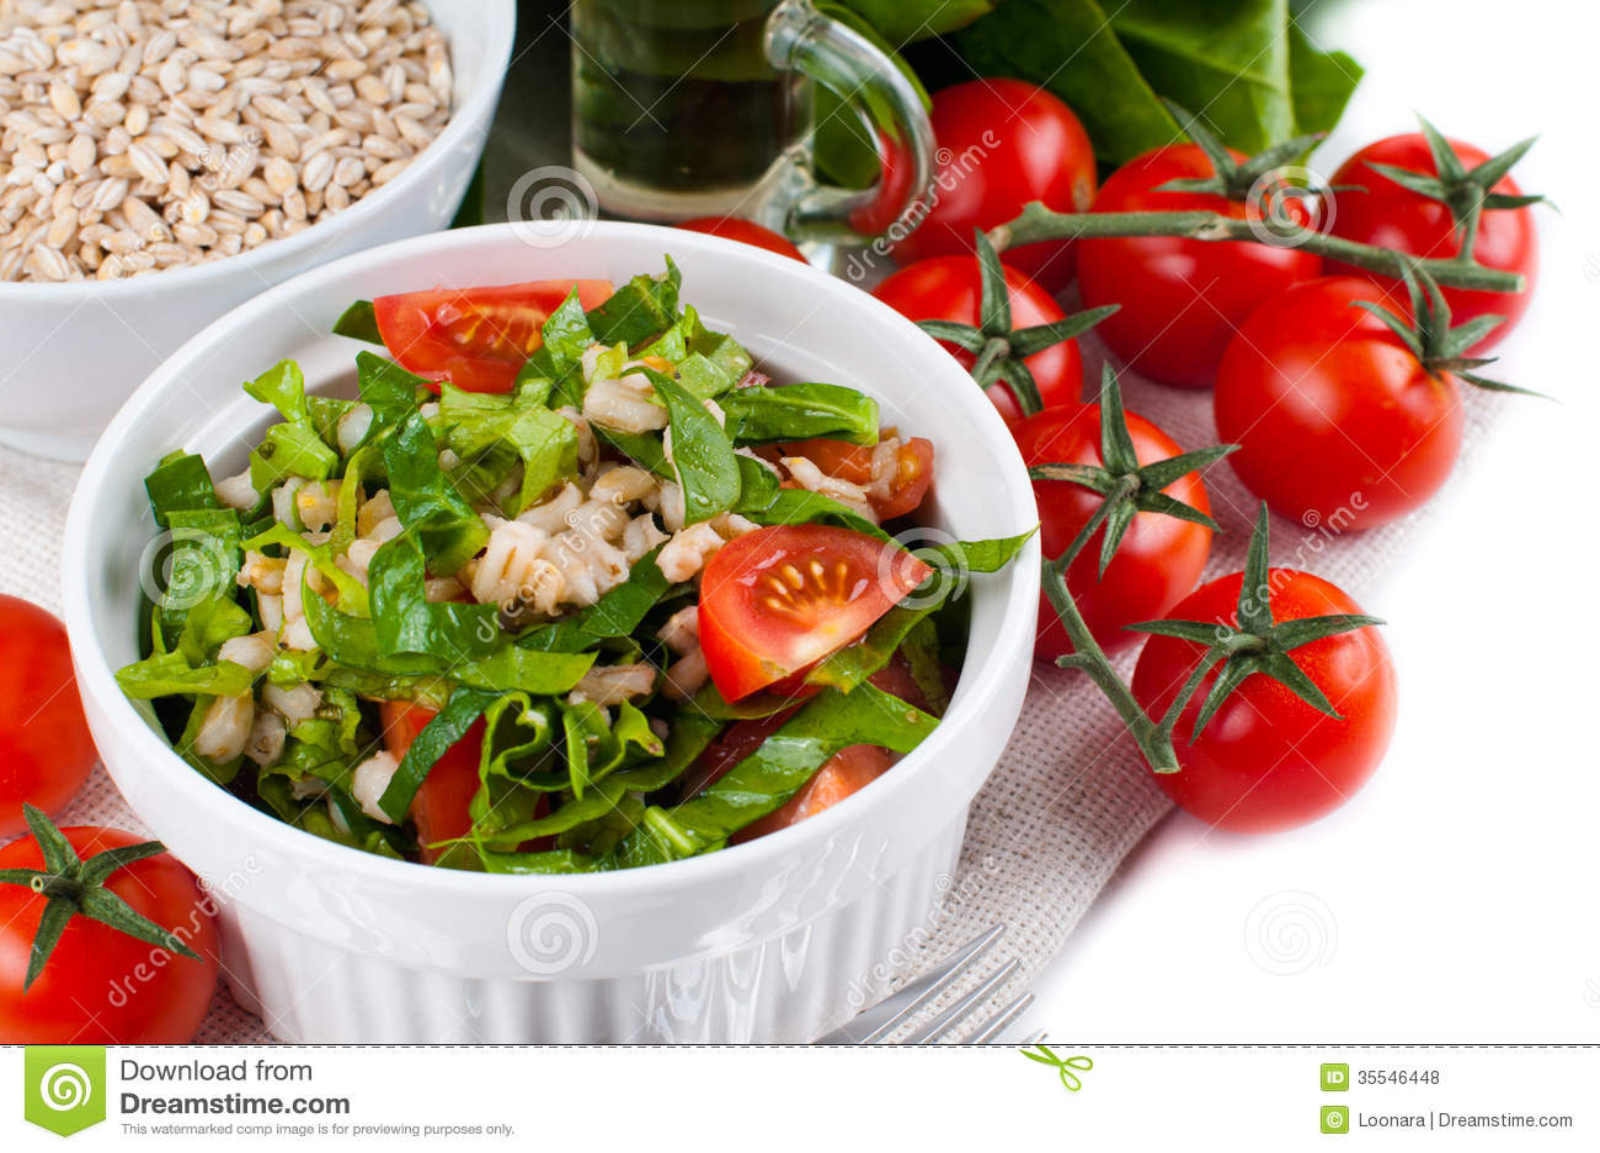 Vegan cuisine food background royalty free stock photos for Cuisine vegan